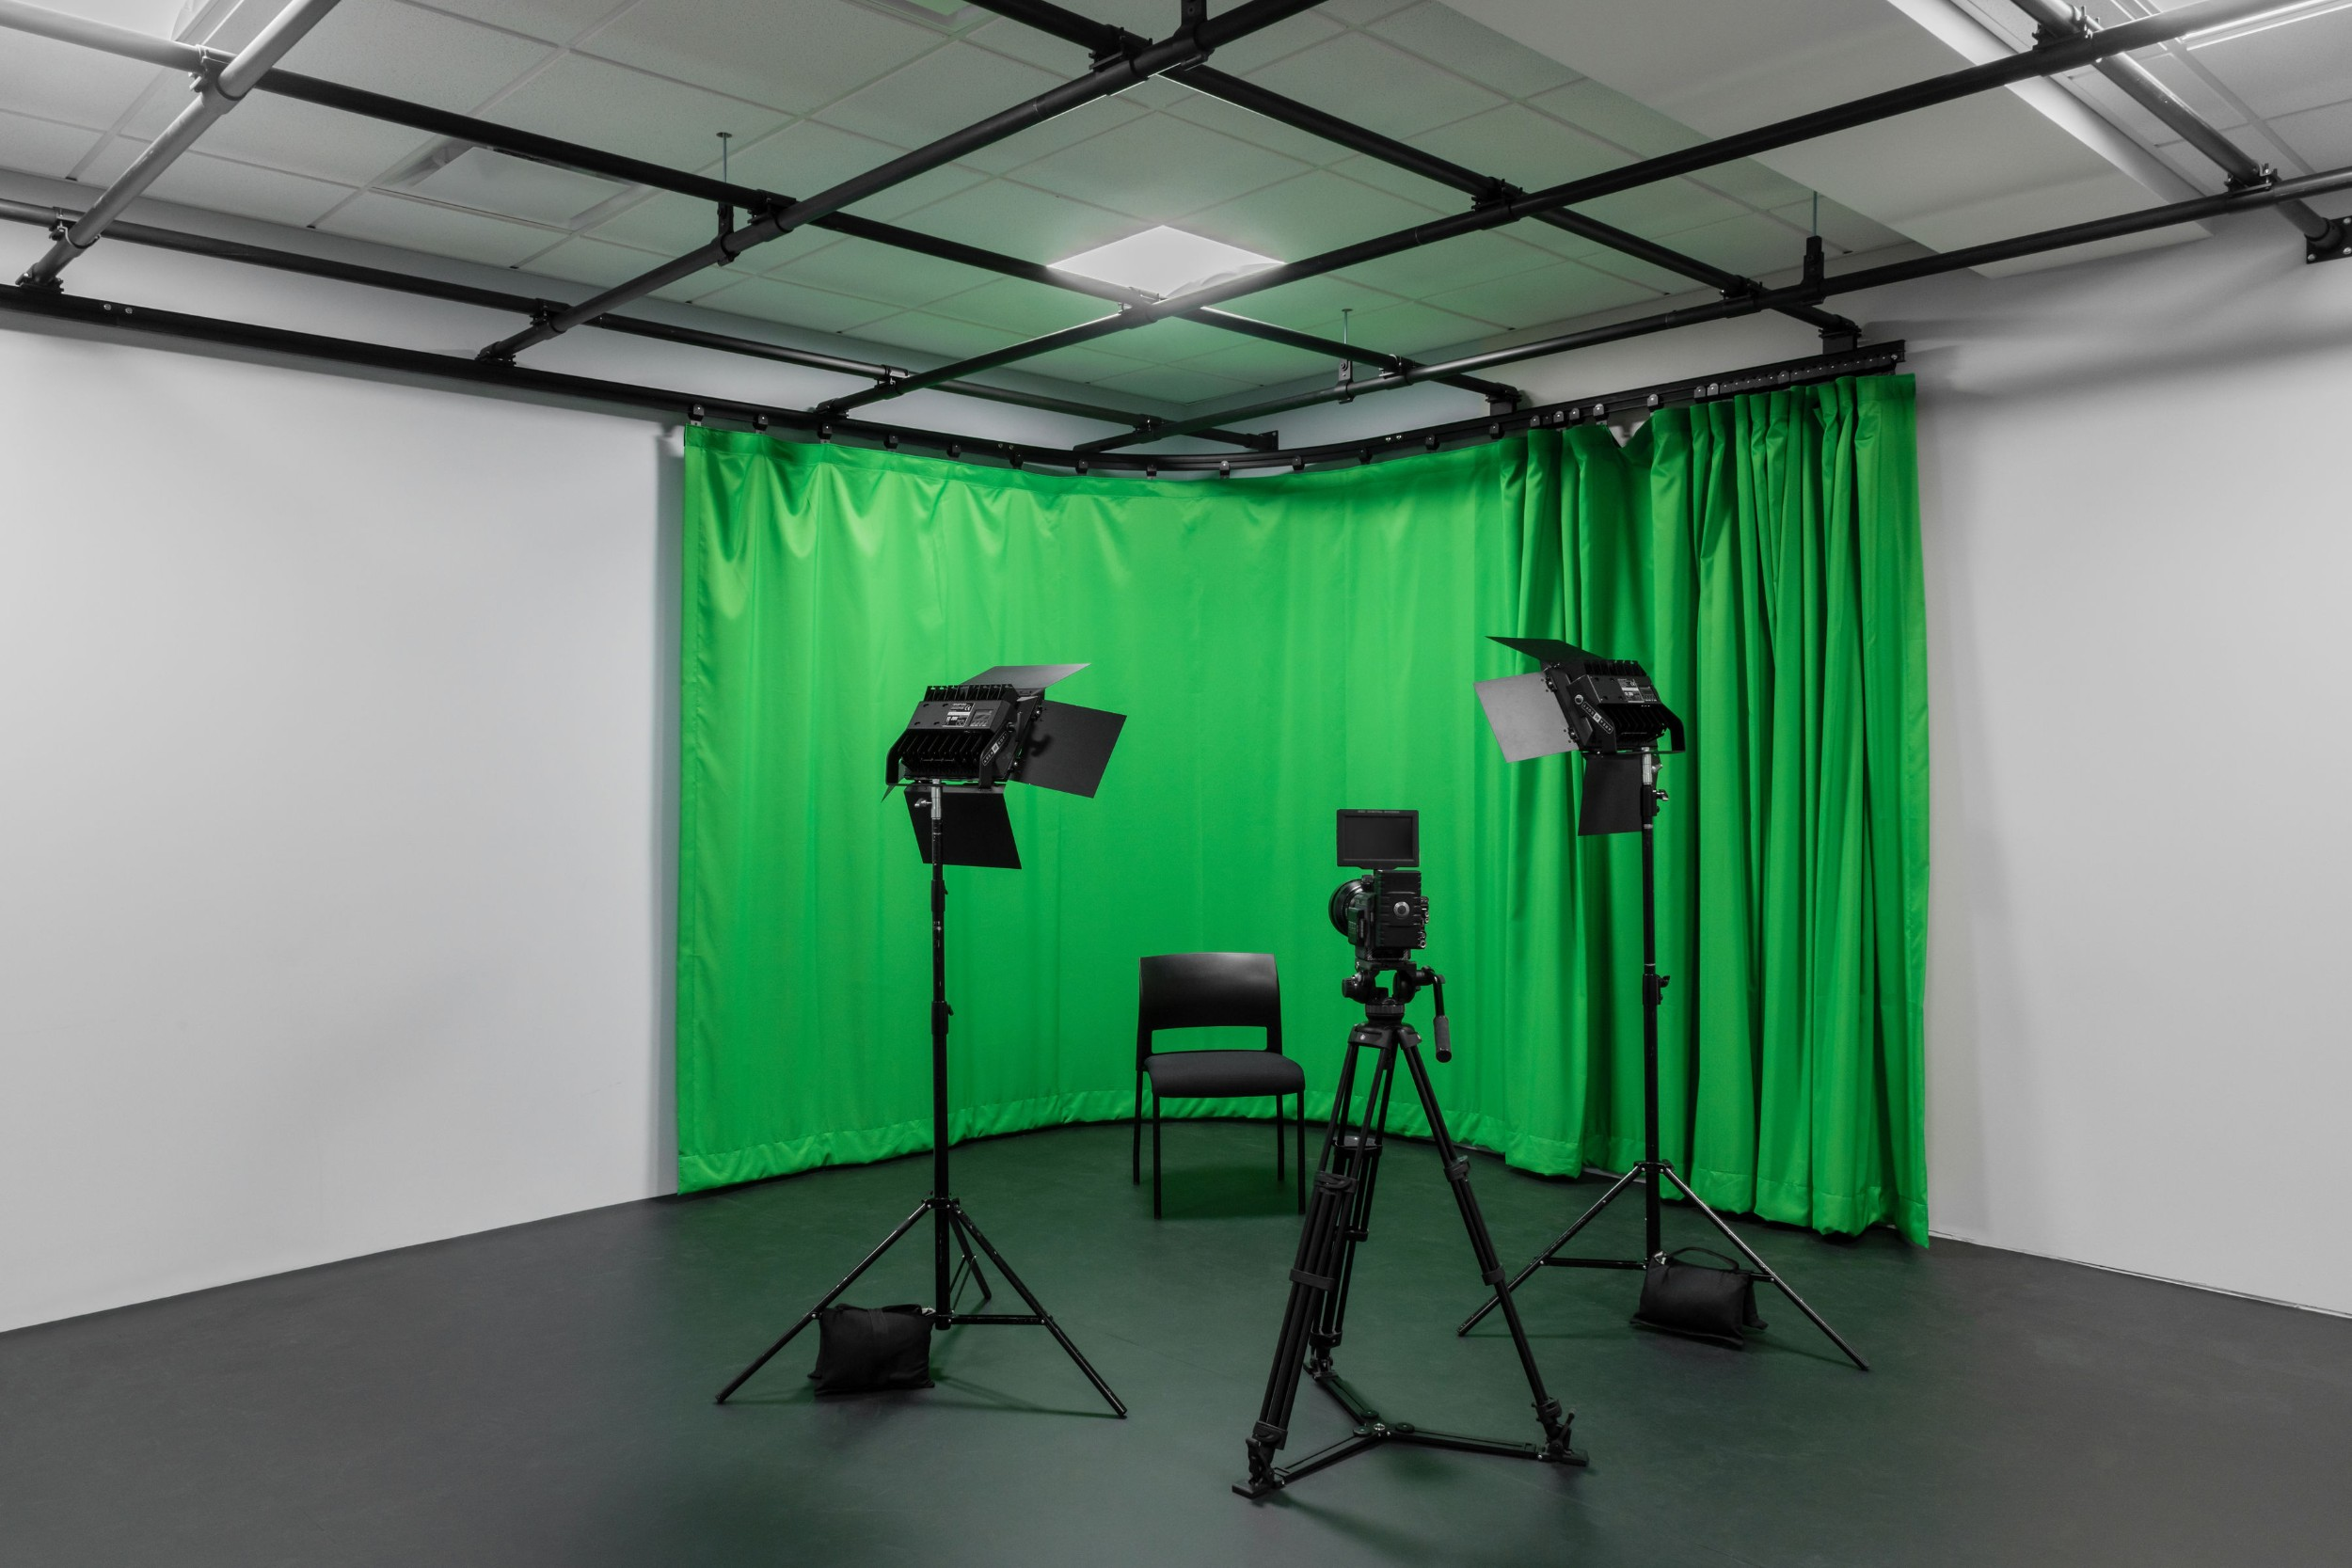 Berklee_Online_Corderman_Construction_Education_Video_Production_Studio.jpg